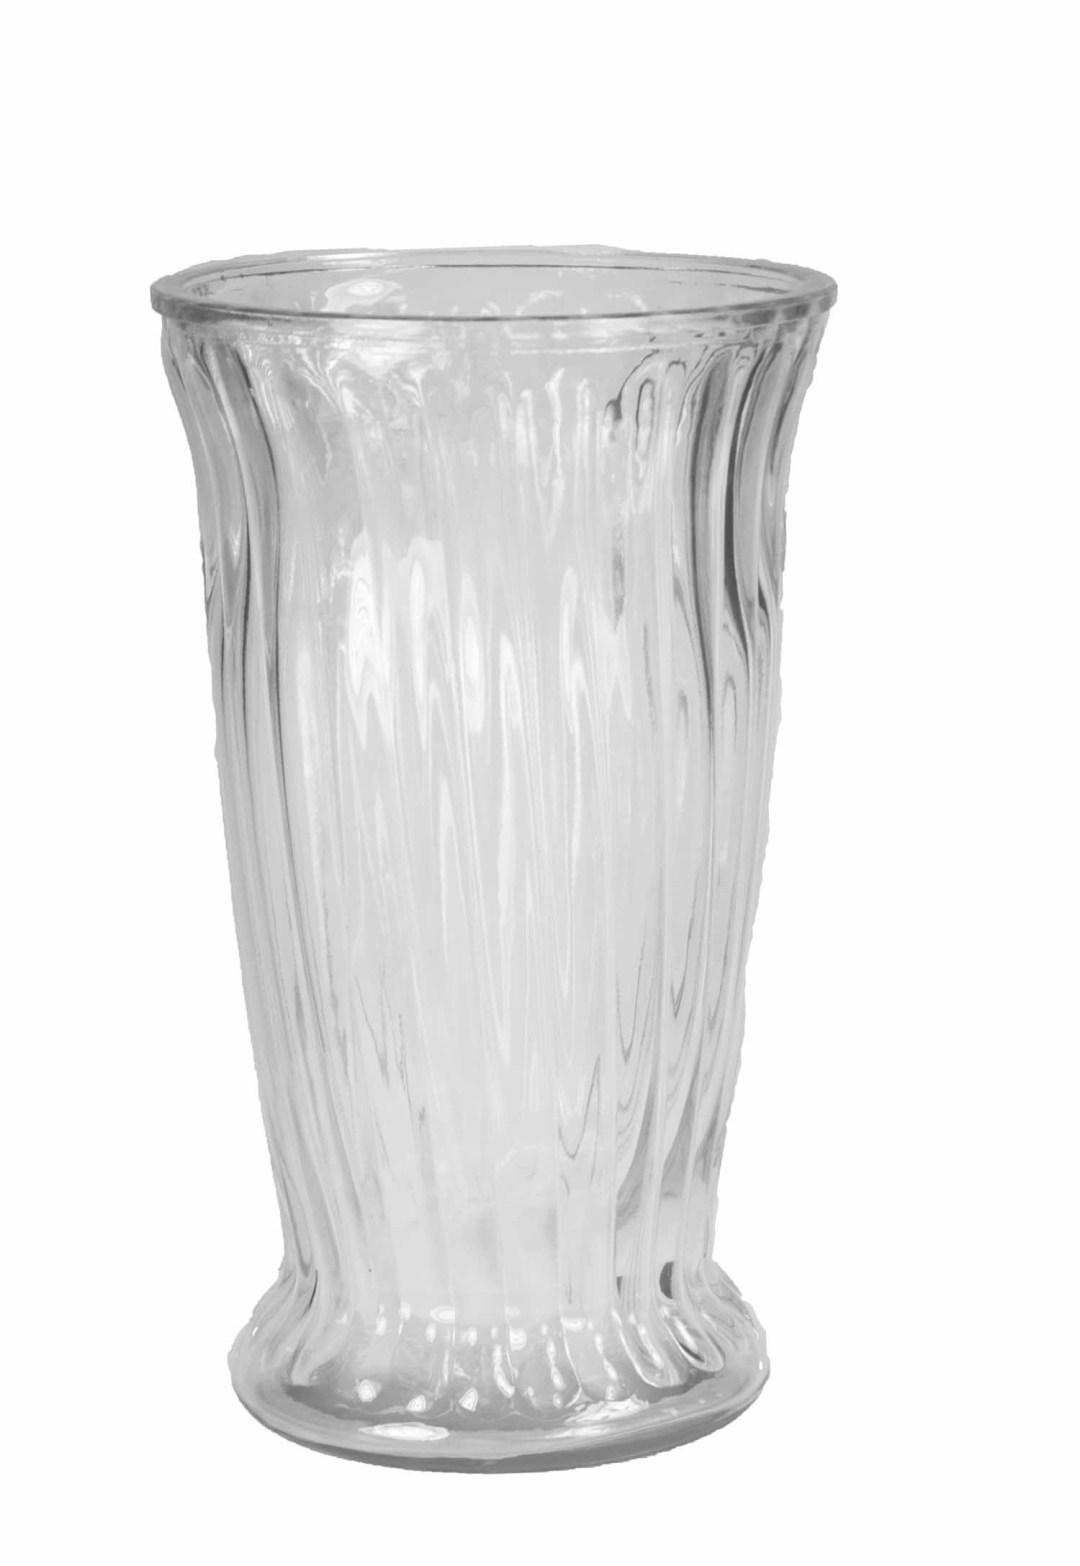 "GP4014CLR - Roman Column Vase 12"" High X 6.75"" Opening $7.95 each GP4014CLR"